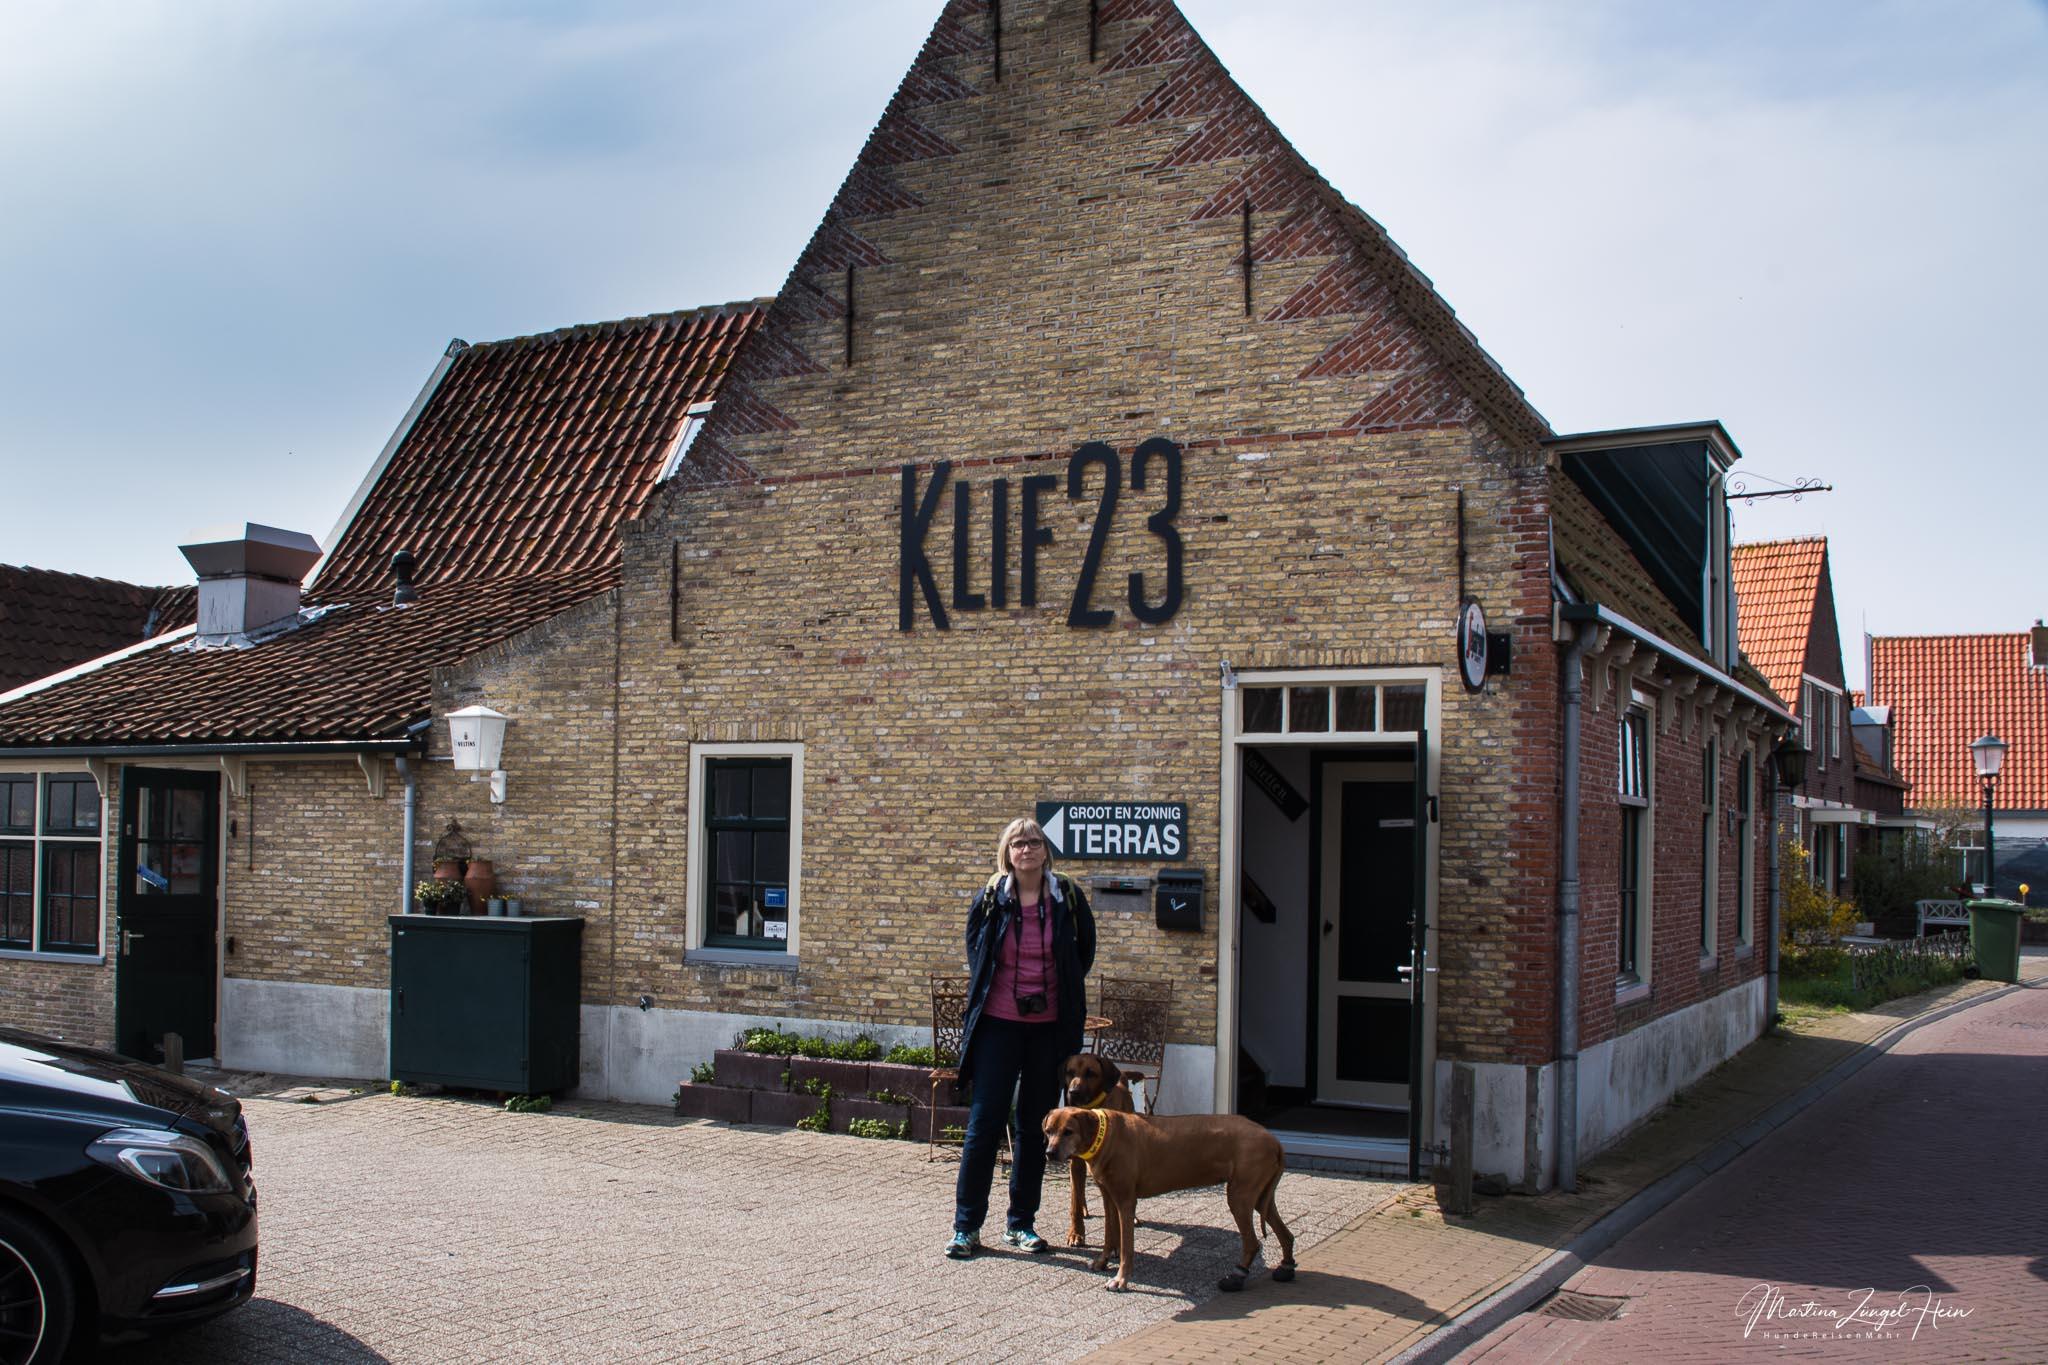 Texel - unterwegs auf der Route Neeltjesnol